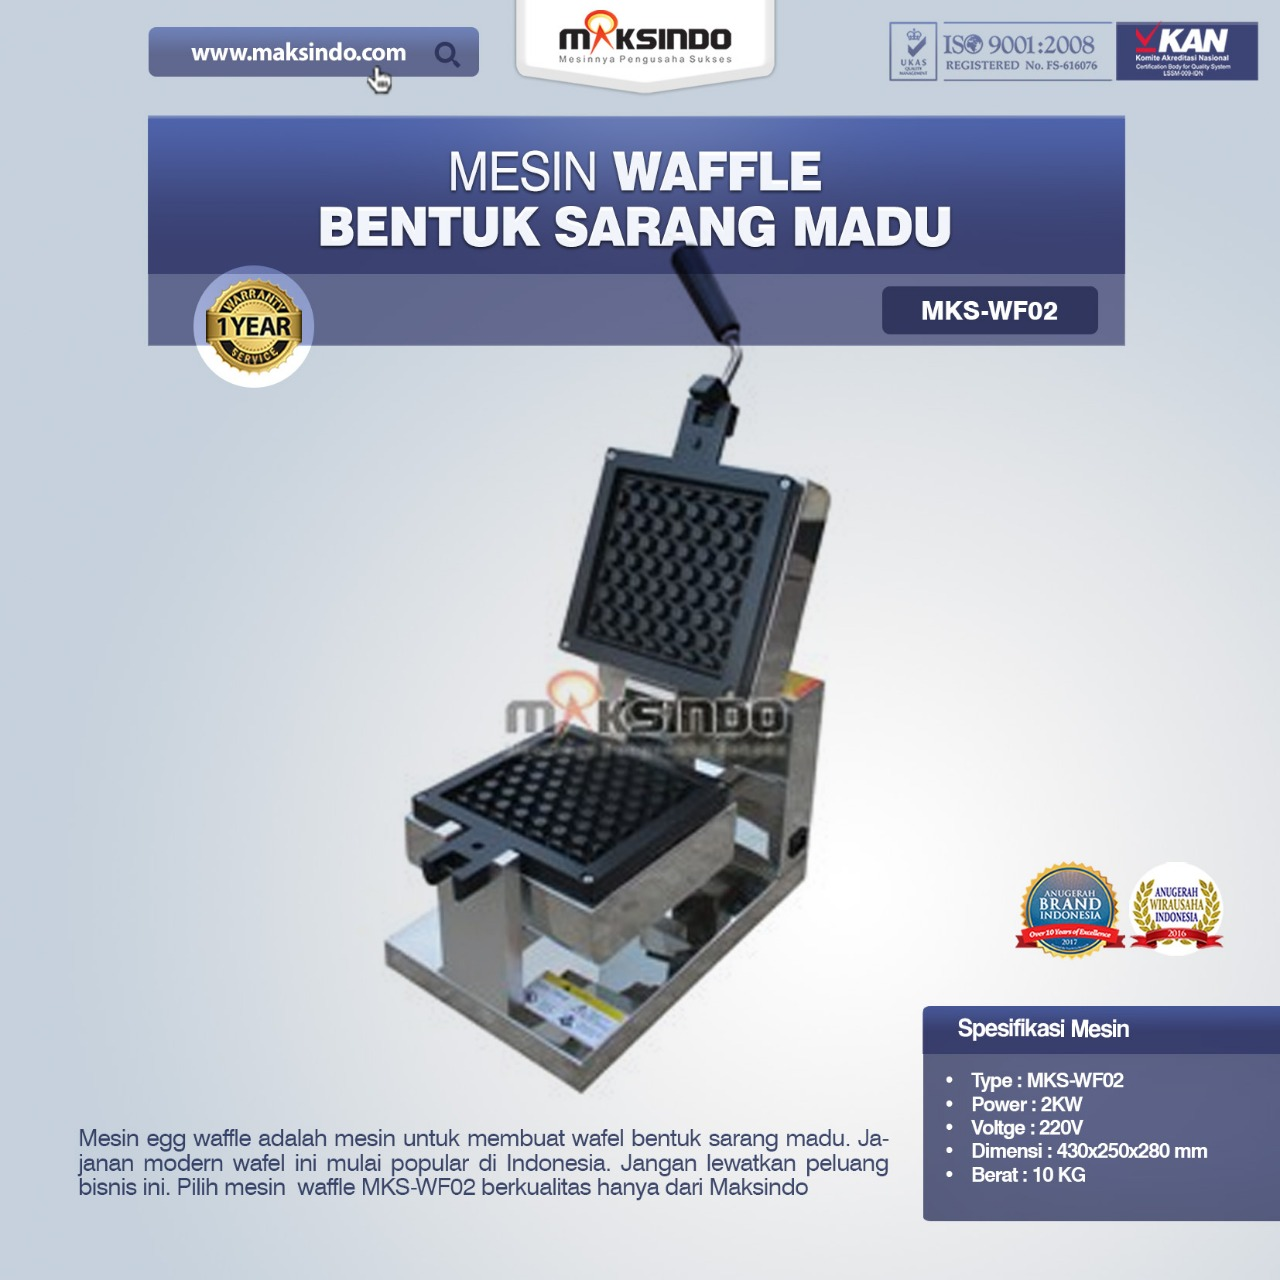 Jual Mesin Waffle Bentuk Sarang Madu MKS-WF02 di Malang